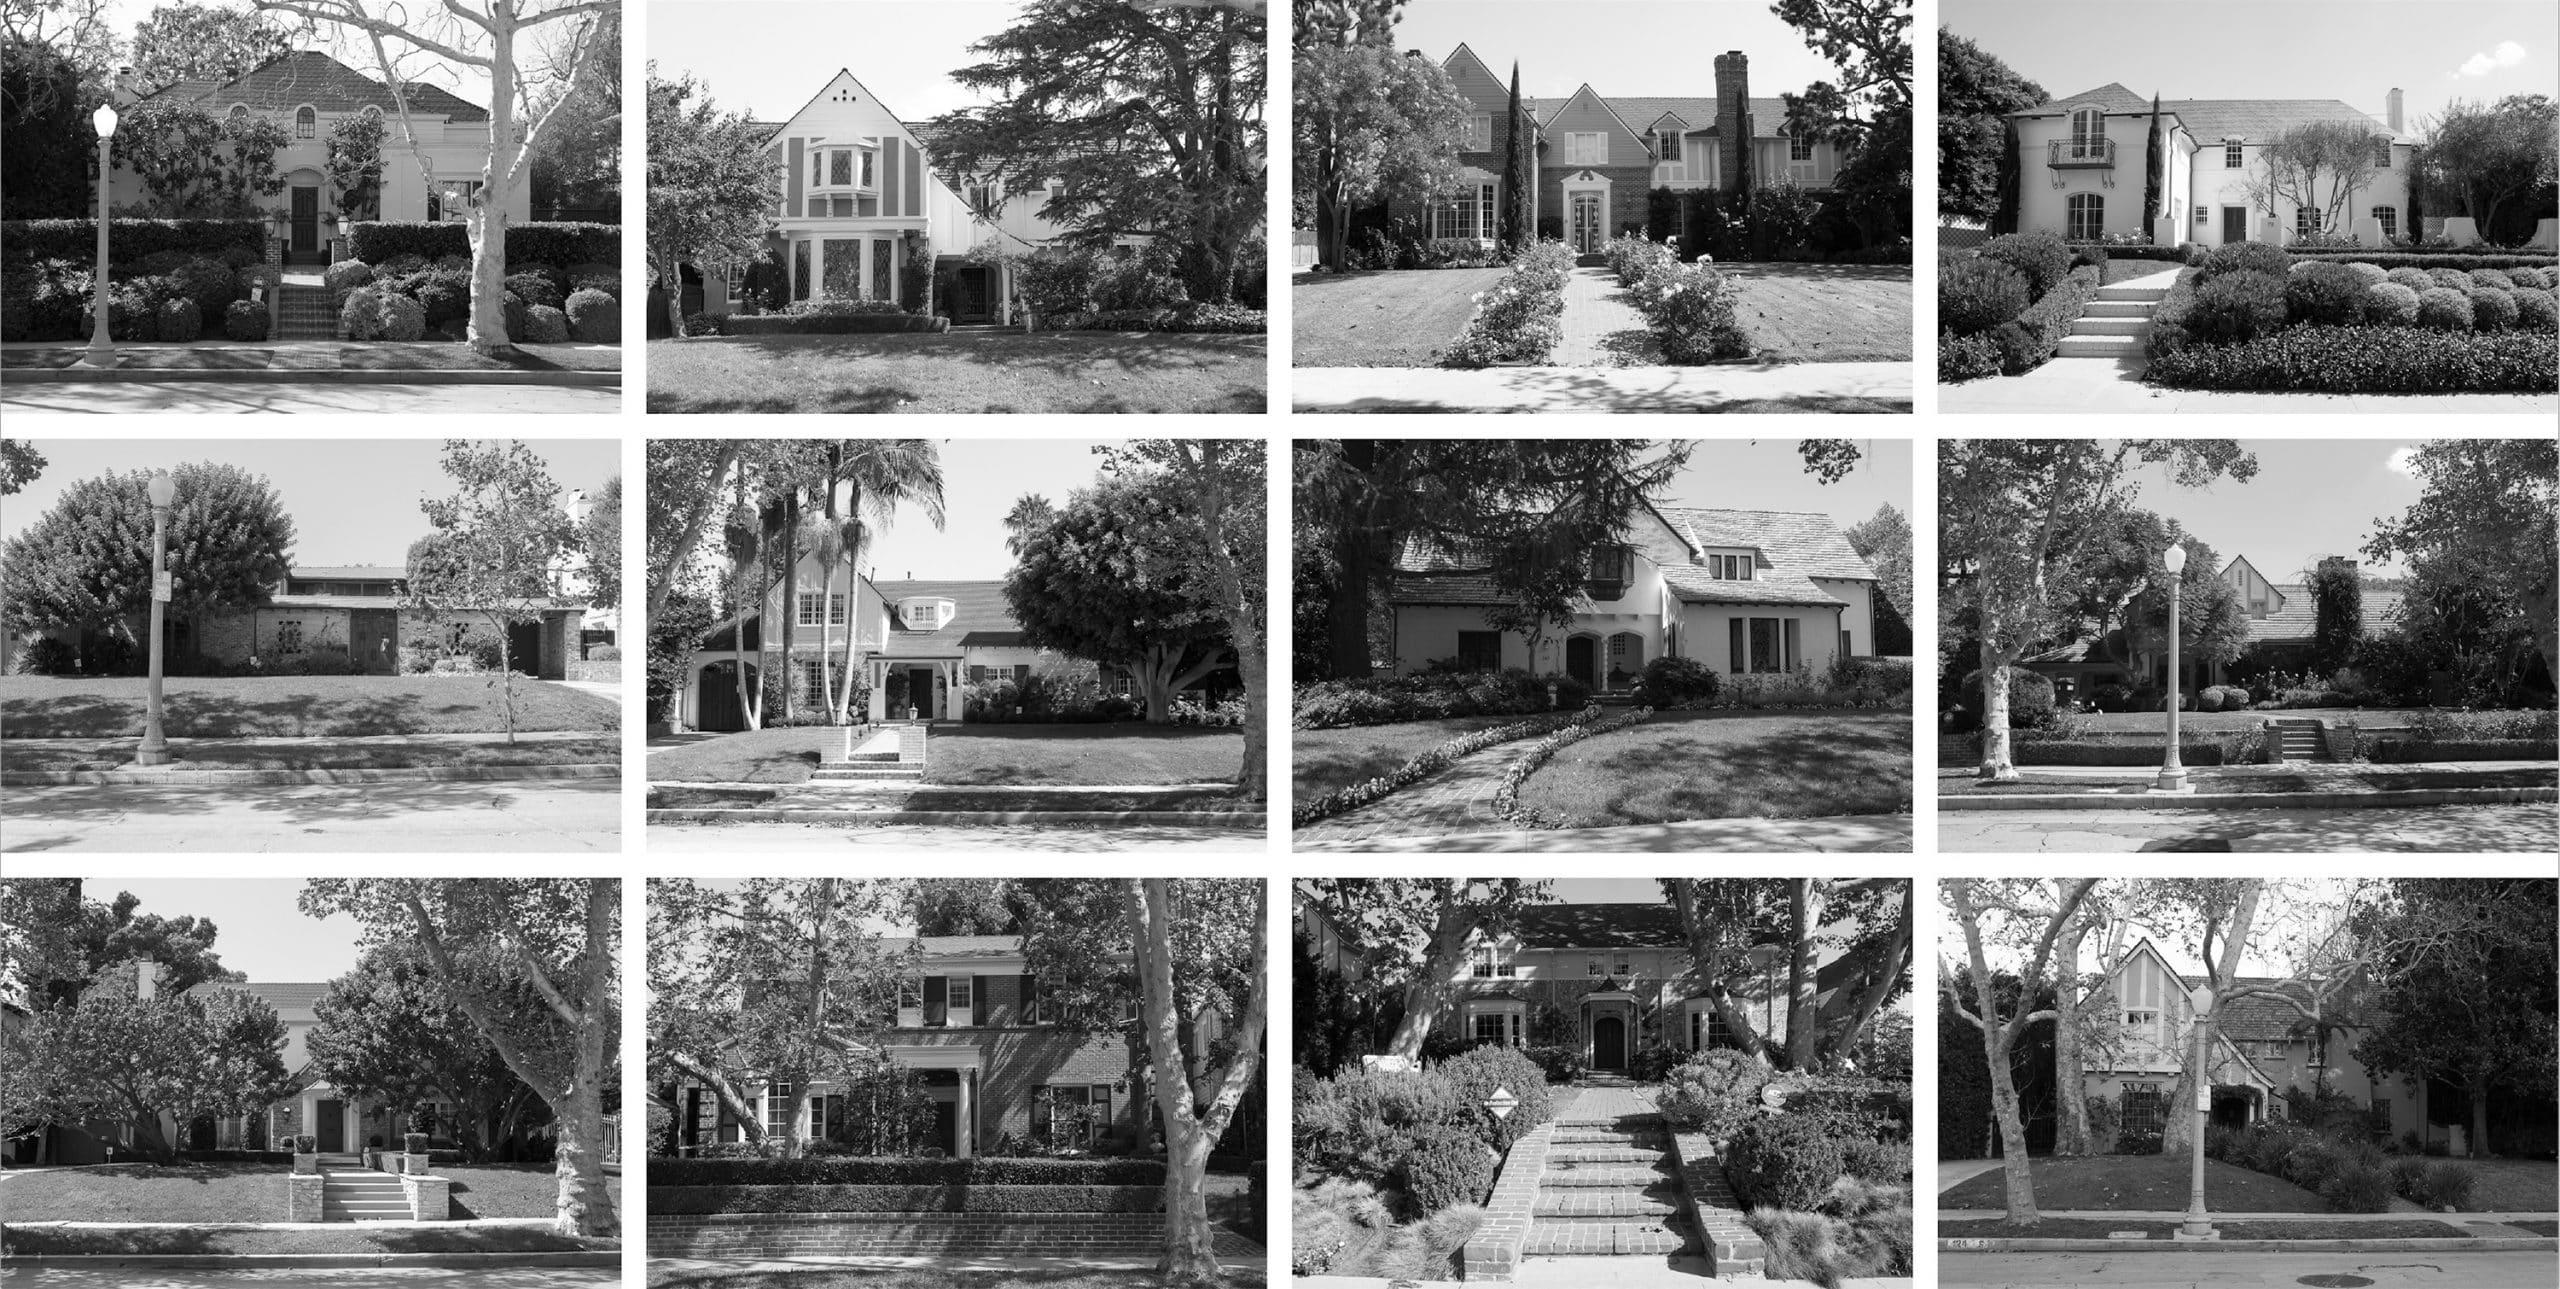 20th century Los Angeles African-American Architect Paul R. Williams Houses Hancock Park Regarding Paul R. Williams: A Photographer's View Janna Ireland